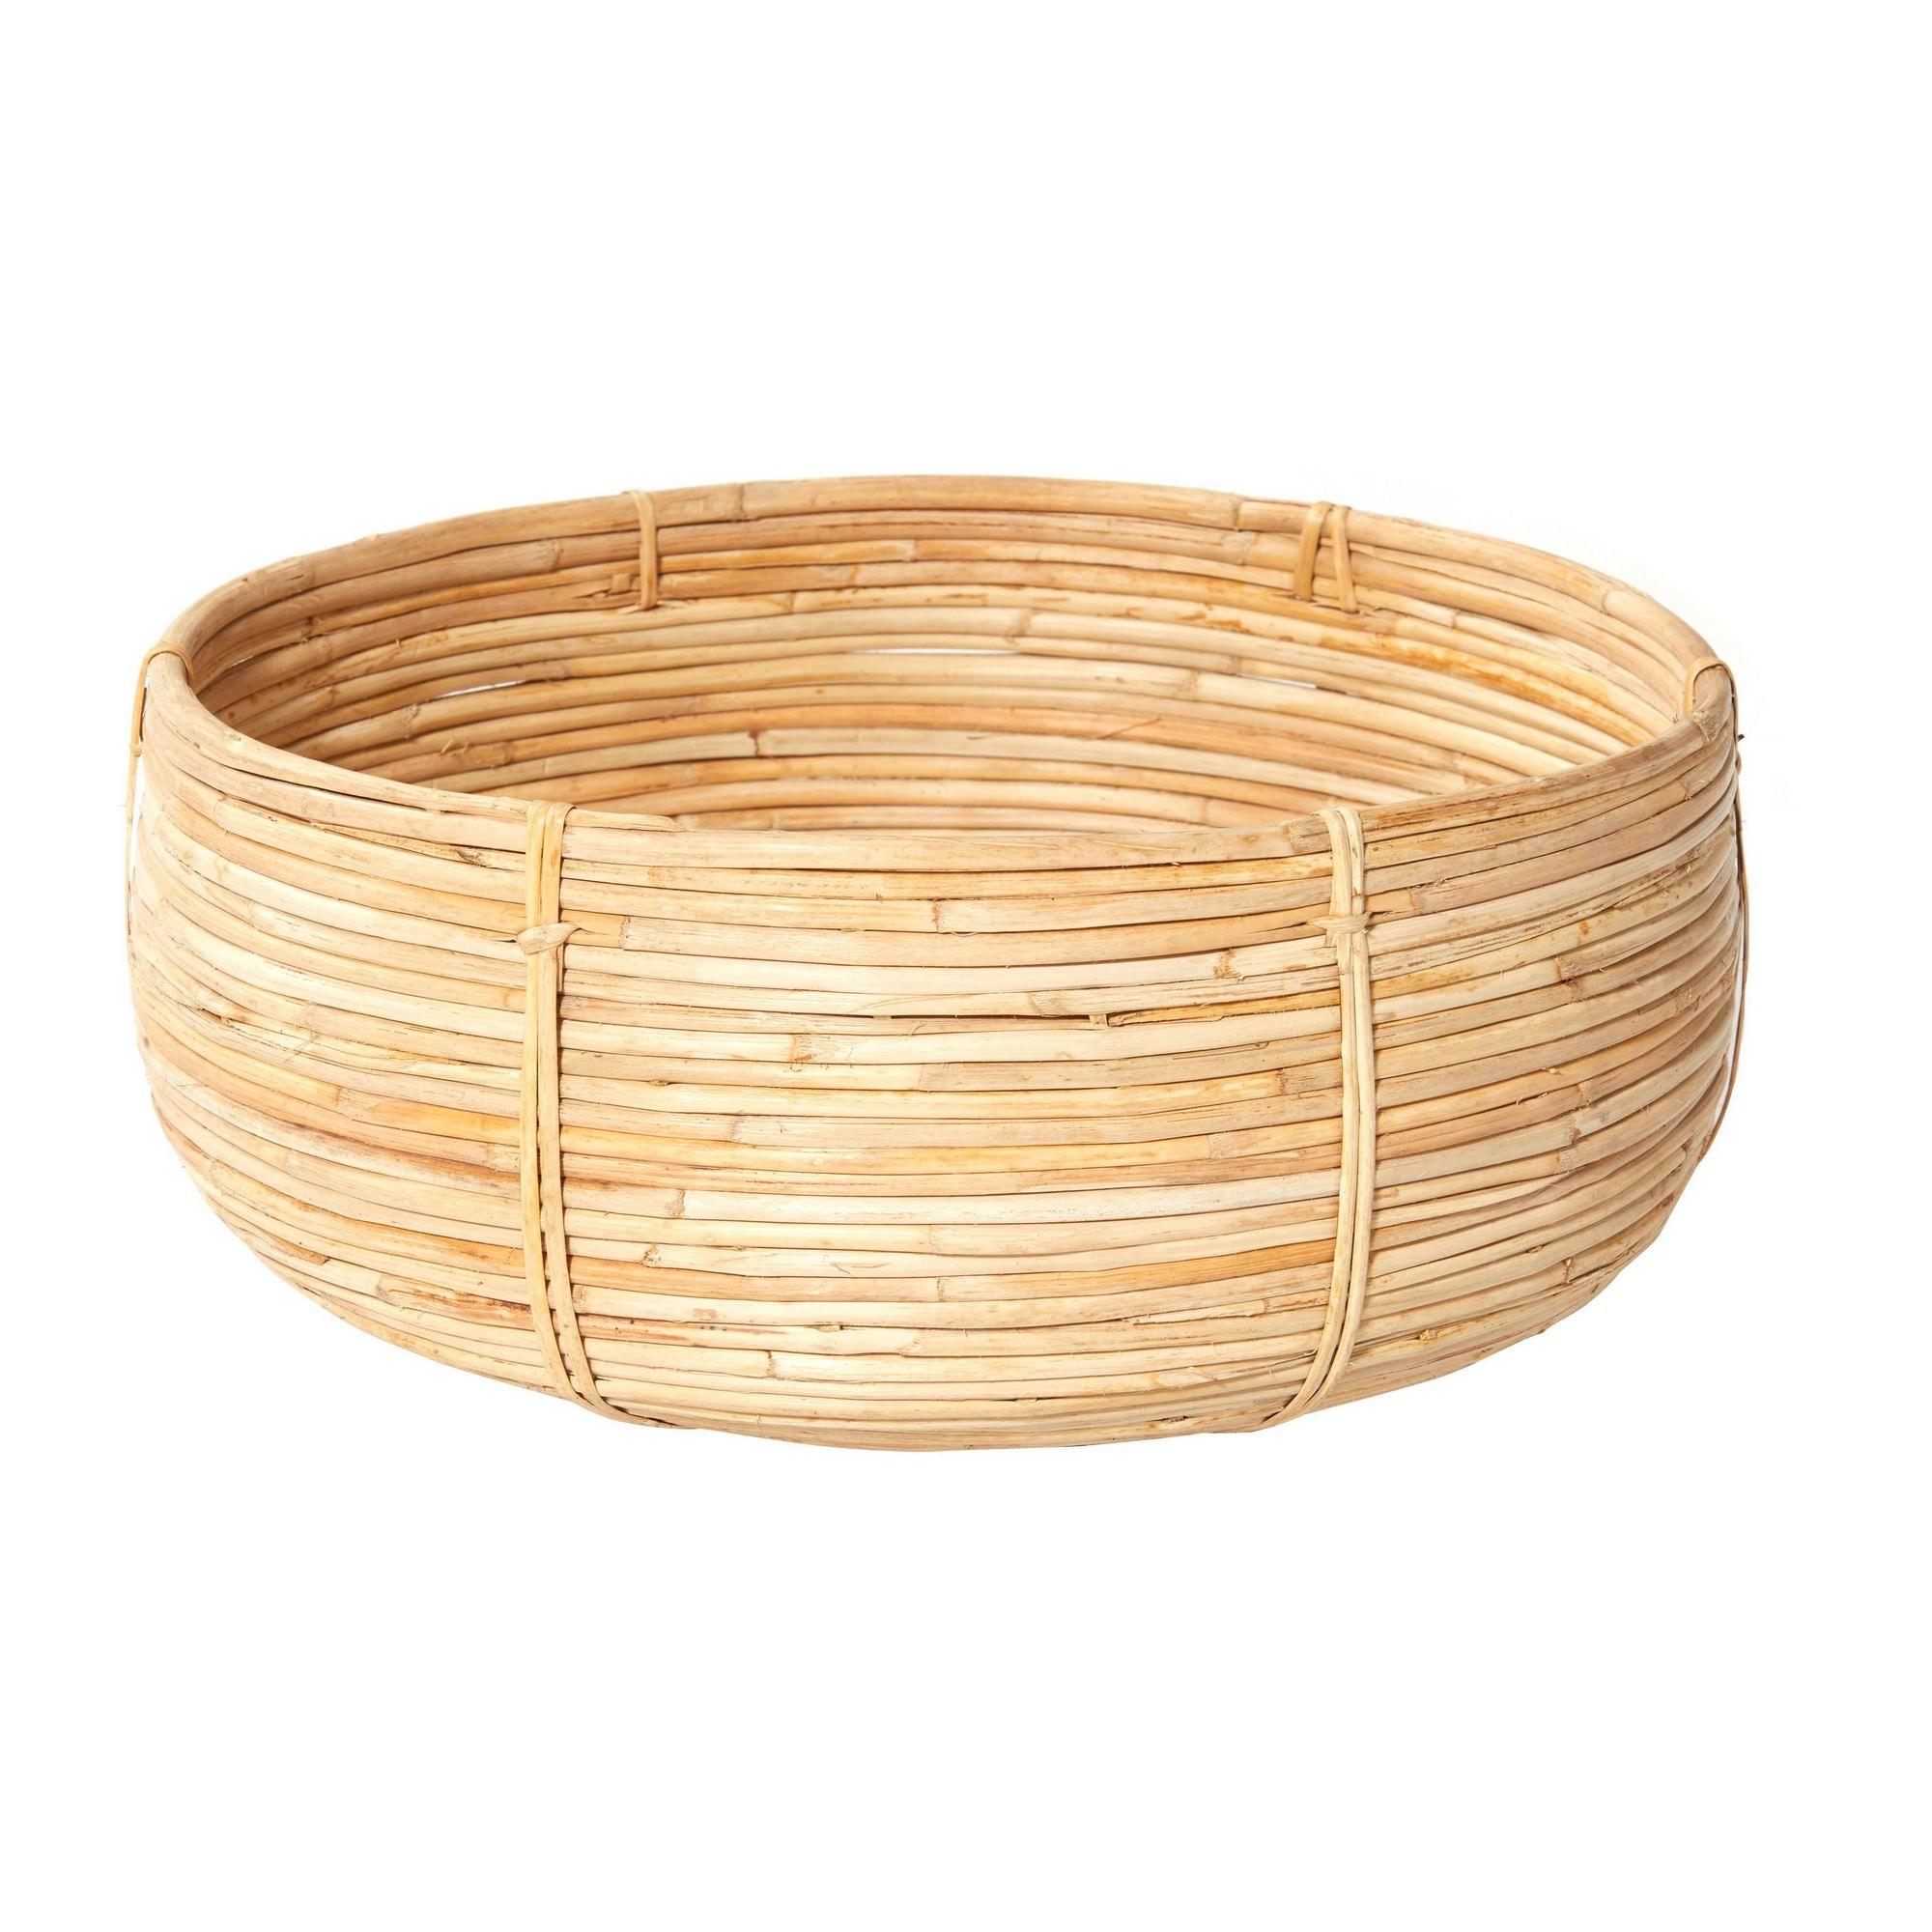 Rohan Cane Basket